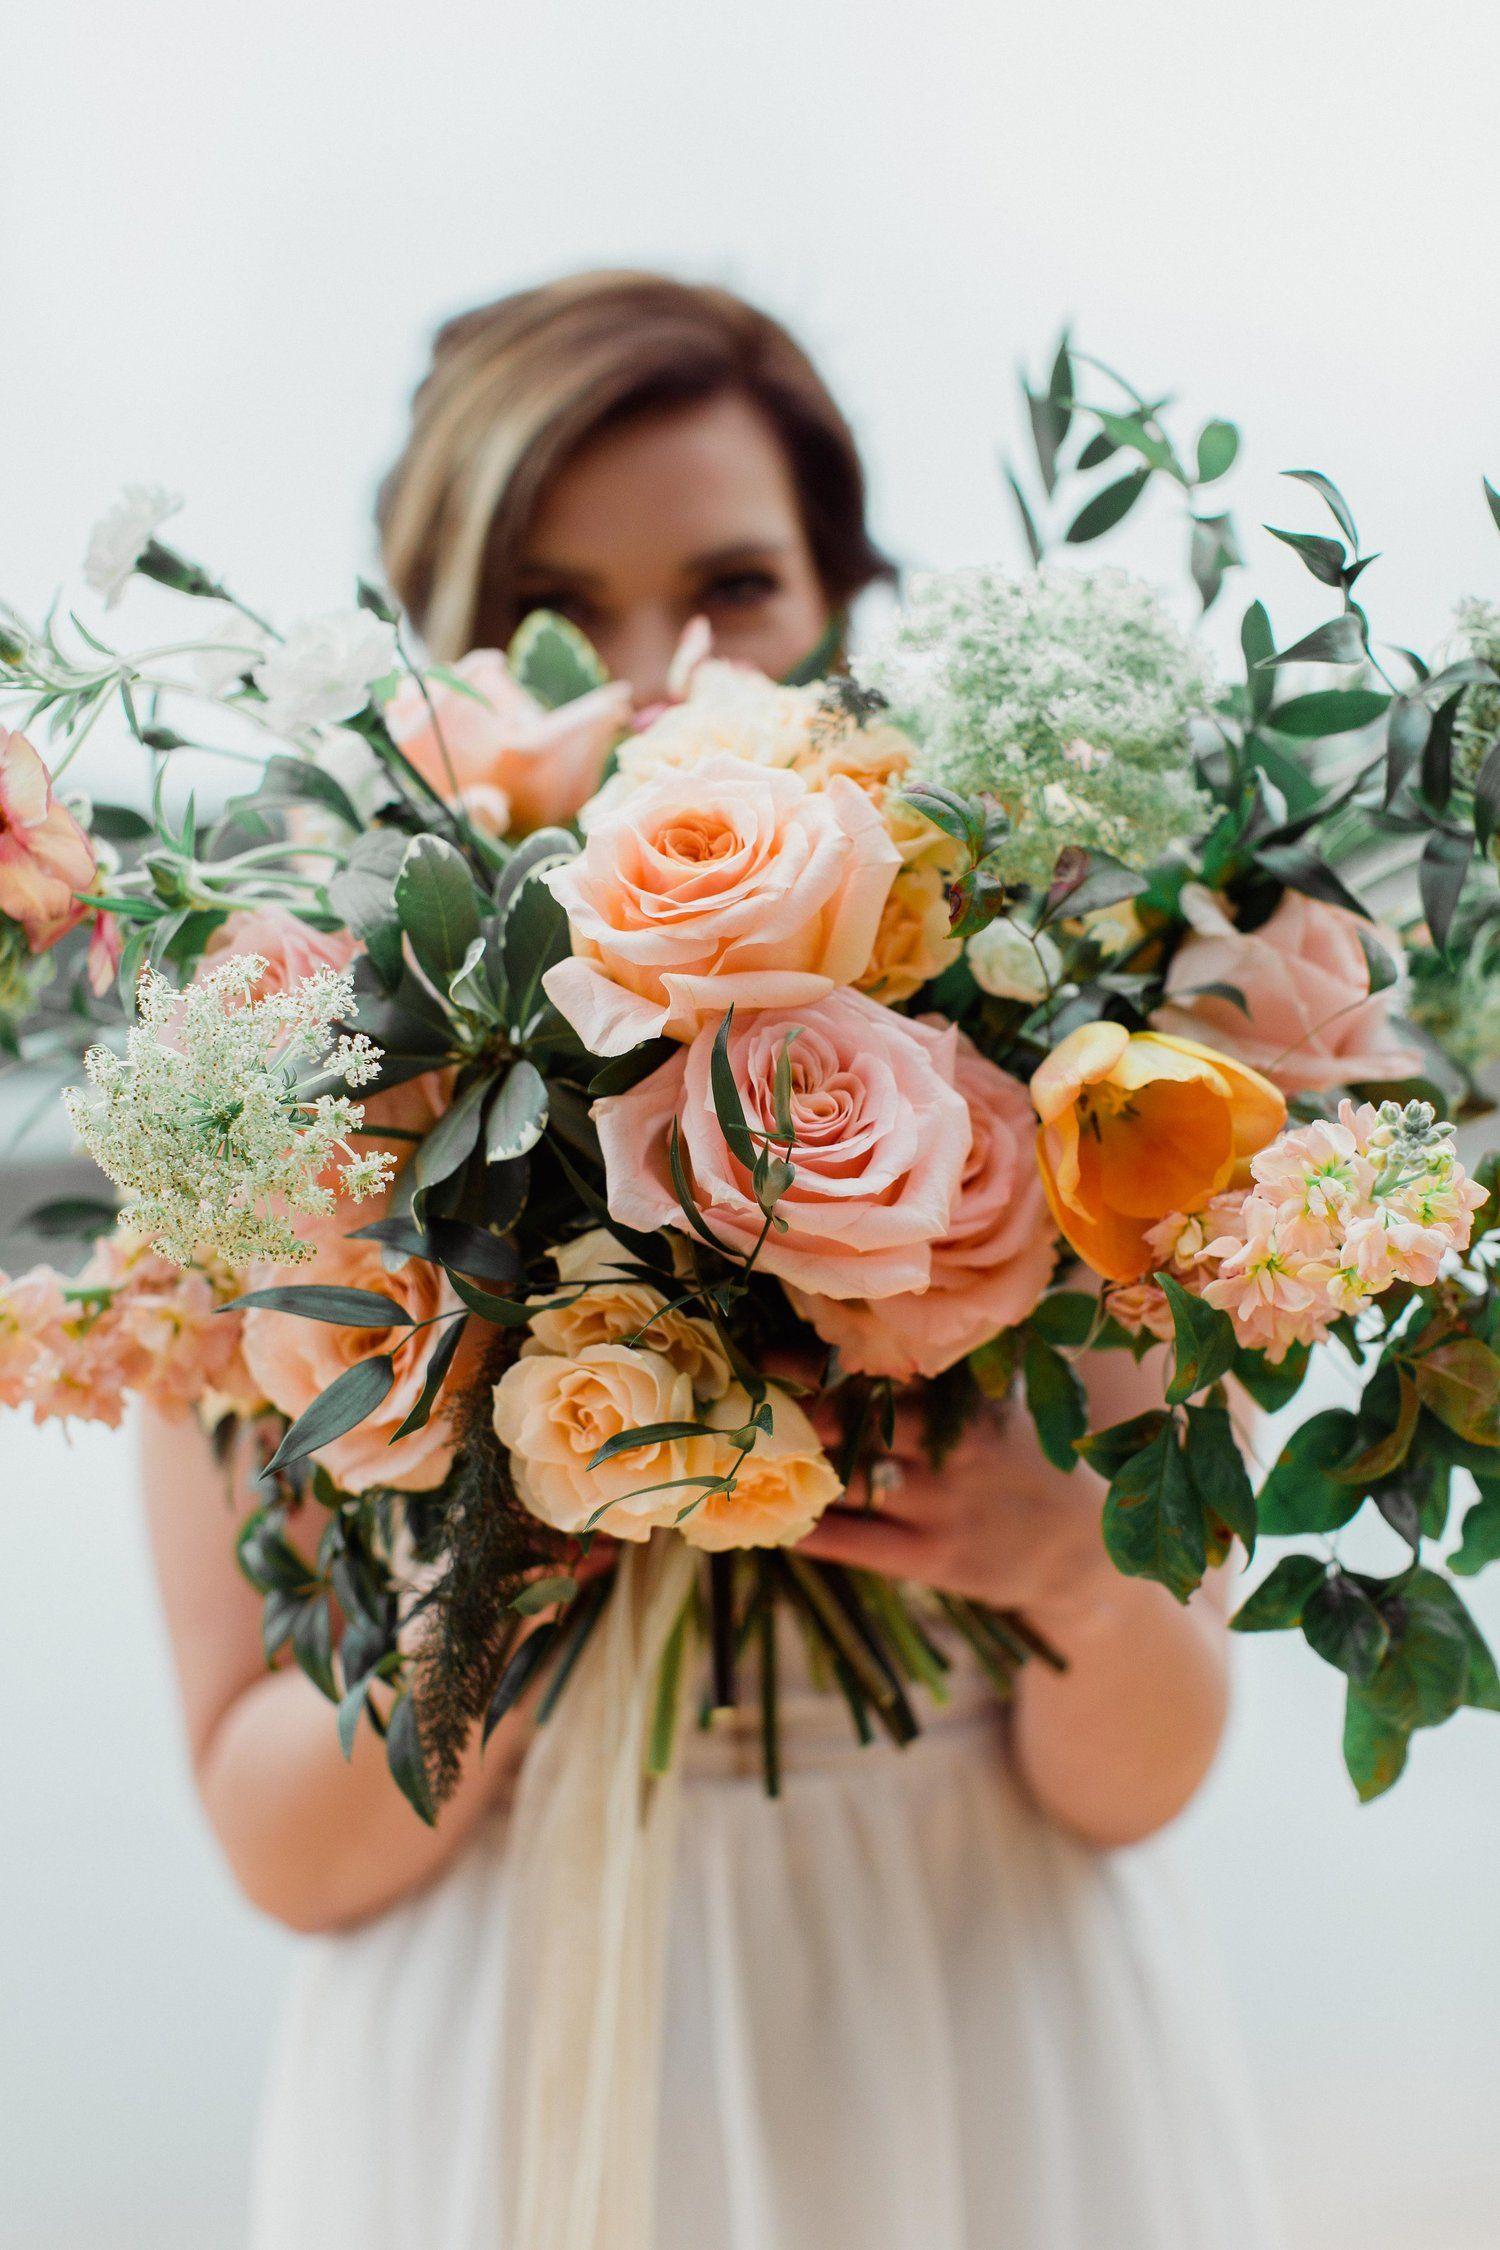 Moody Boho Wedding Flower Bouquet Raleigh And Durham Nc Wedding Florist Creates Moody Boho Peach Wedding Flowers Boho Wedding Flowers Fall Wedding Flowers